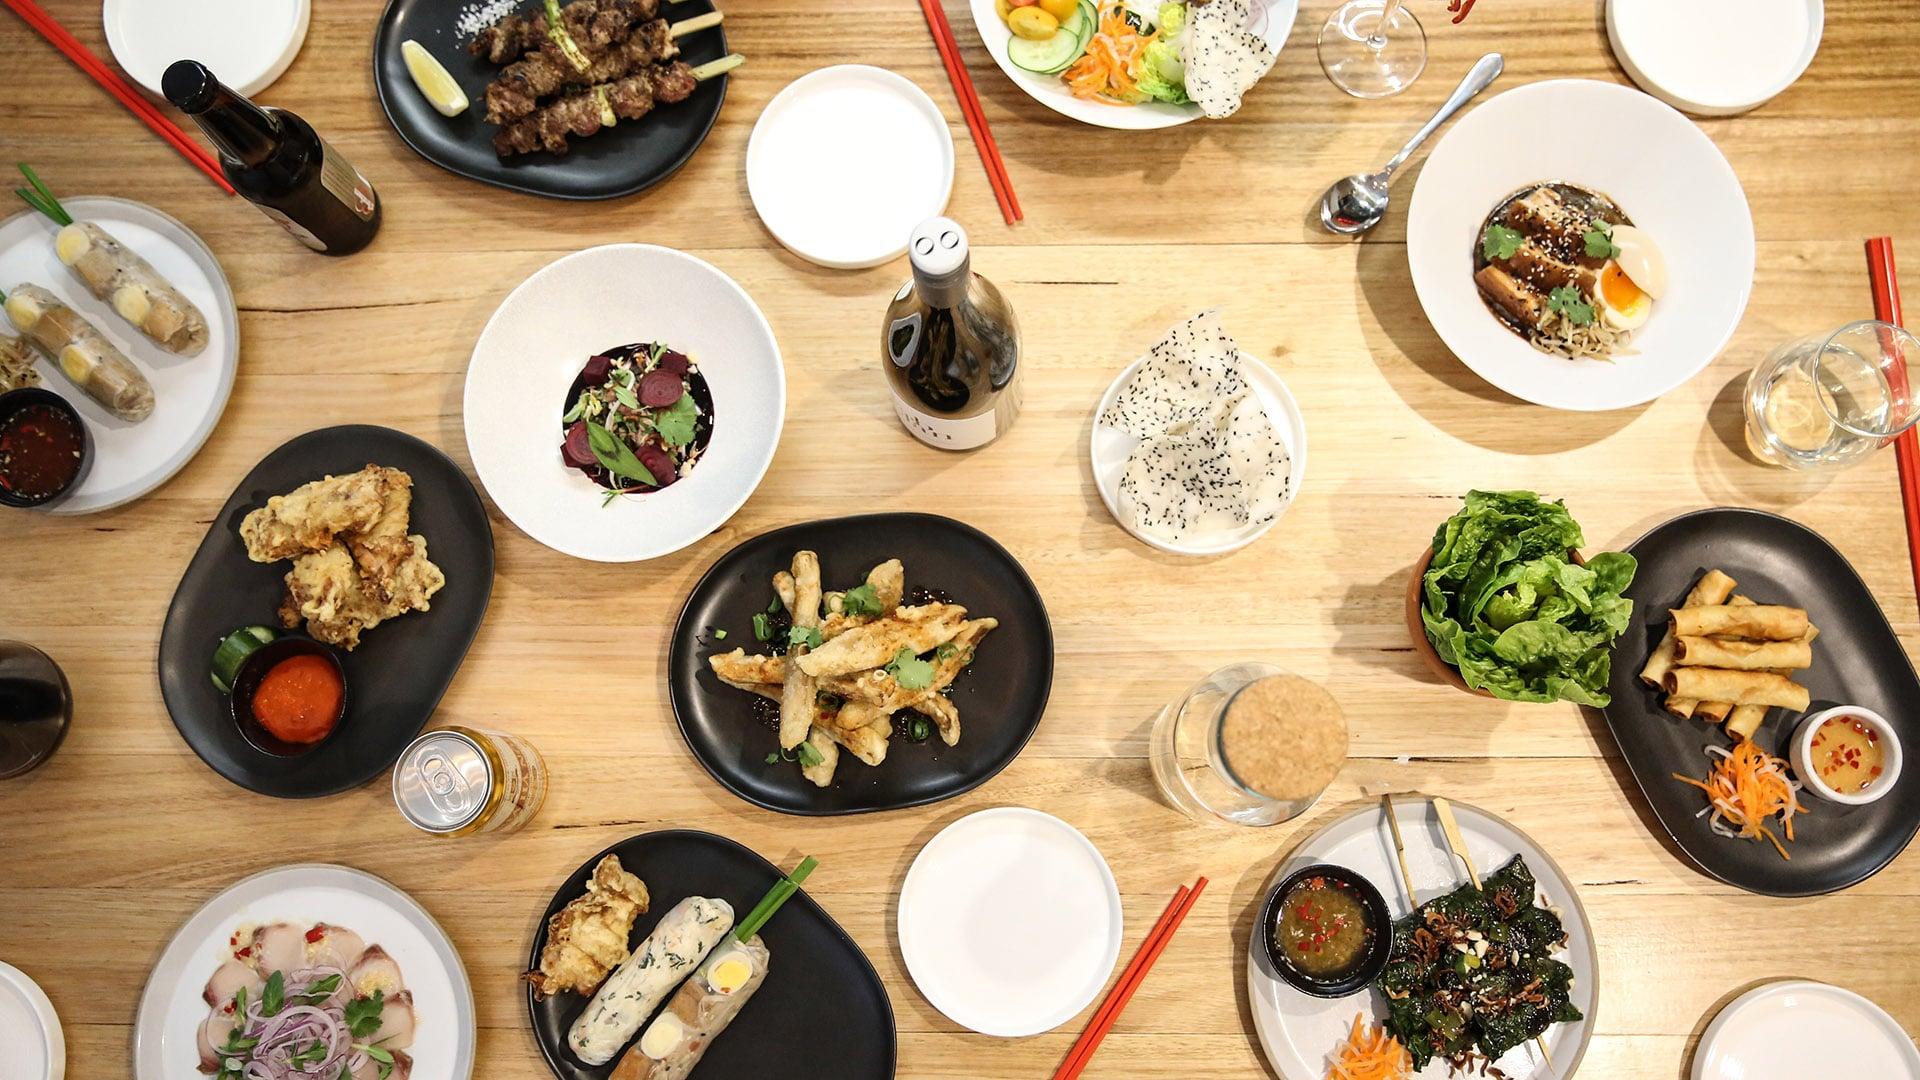 Vietnam Food And Beverage Insights Q1 2017 - Vietcetera